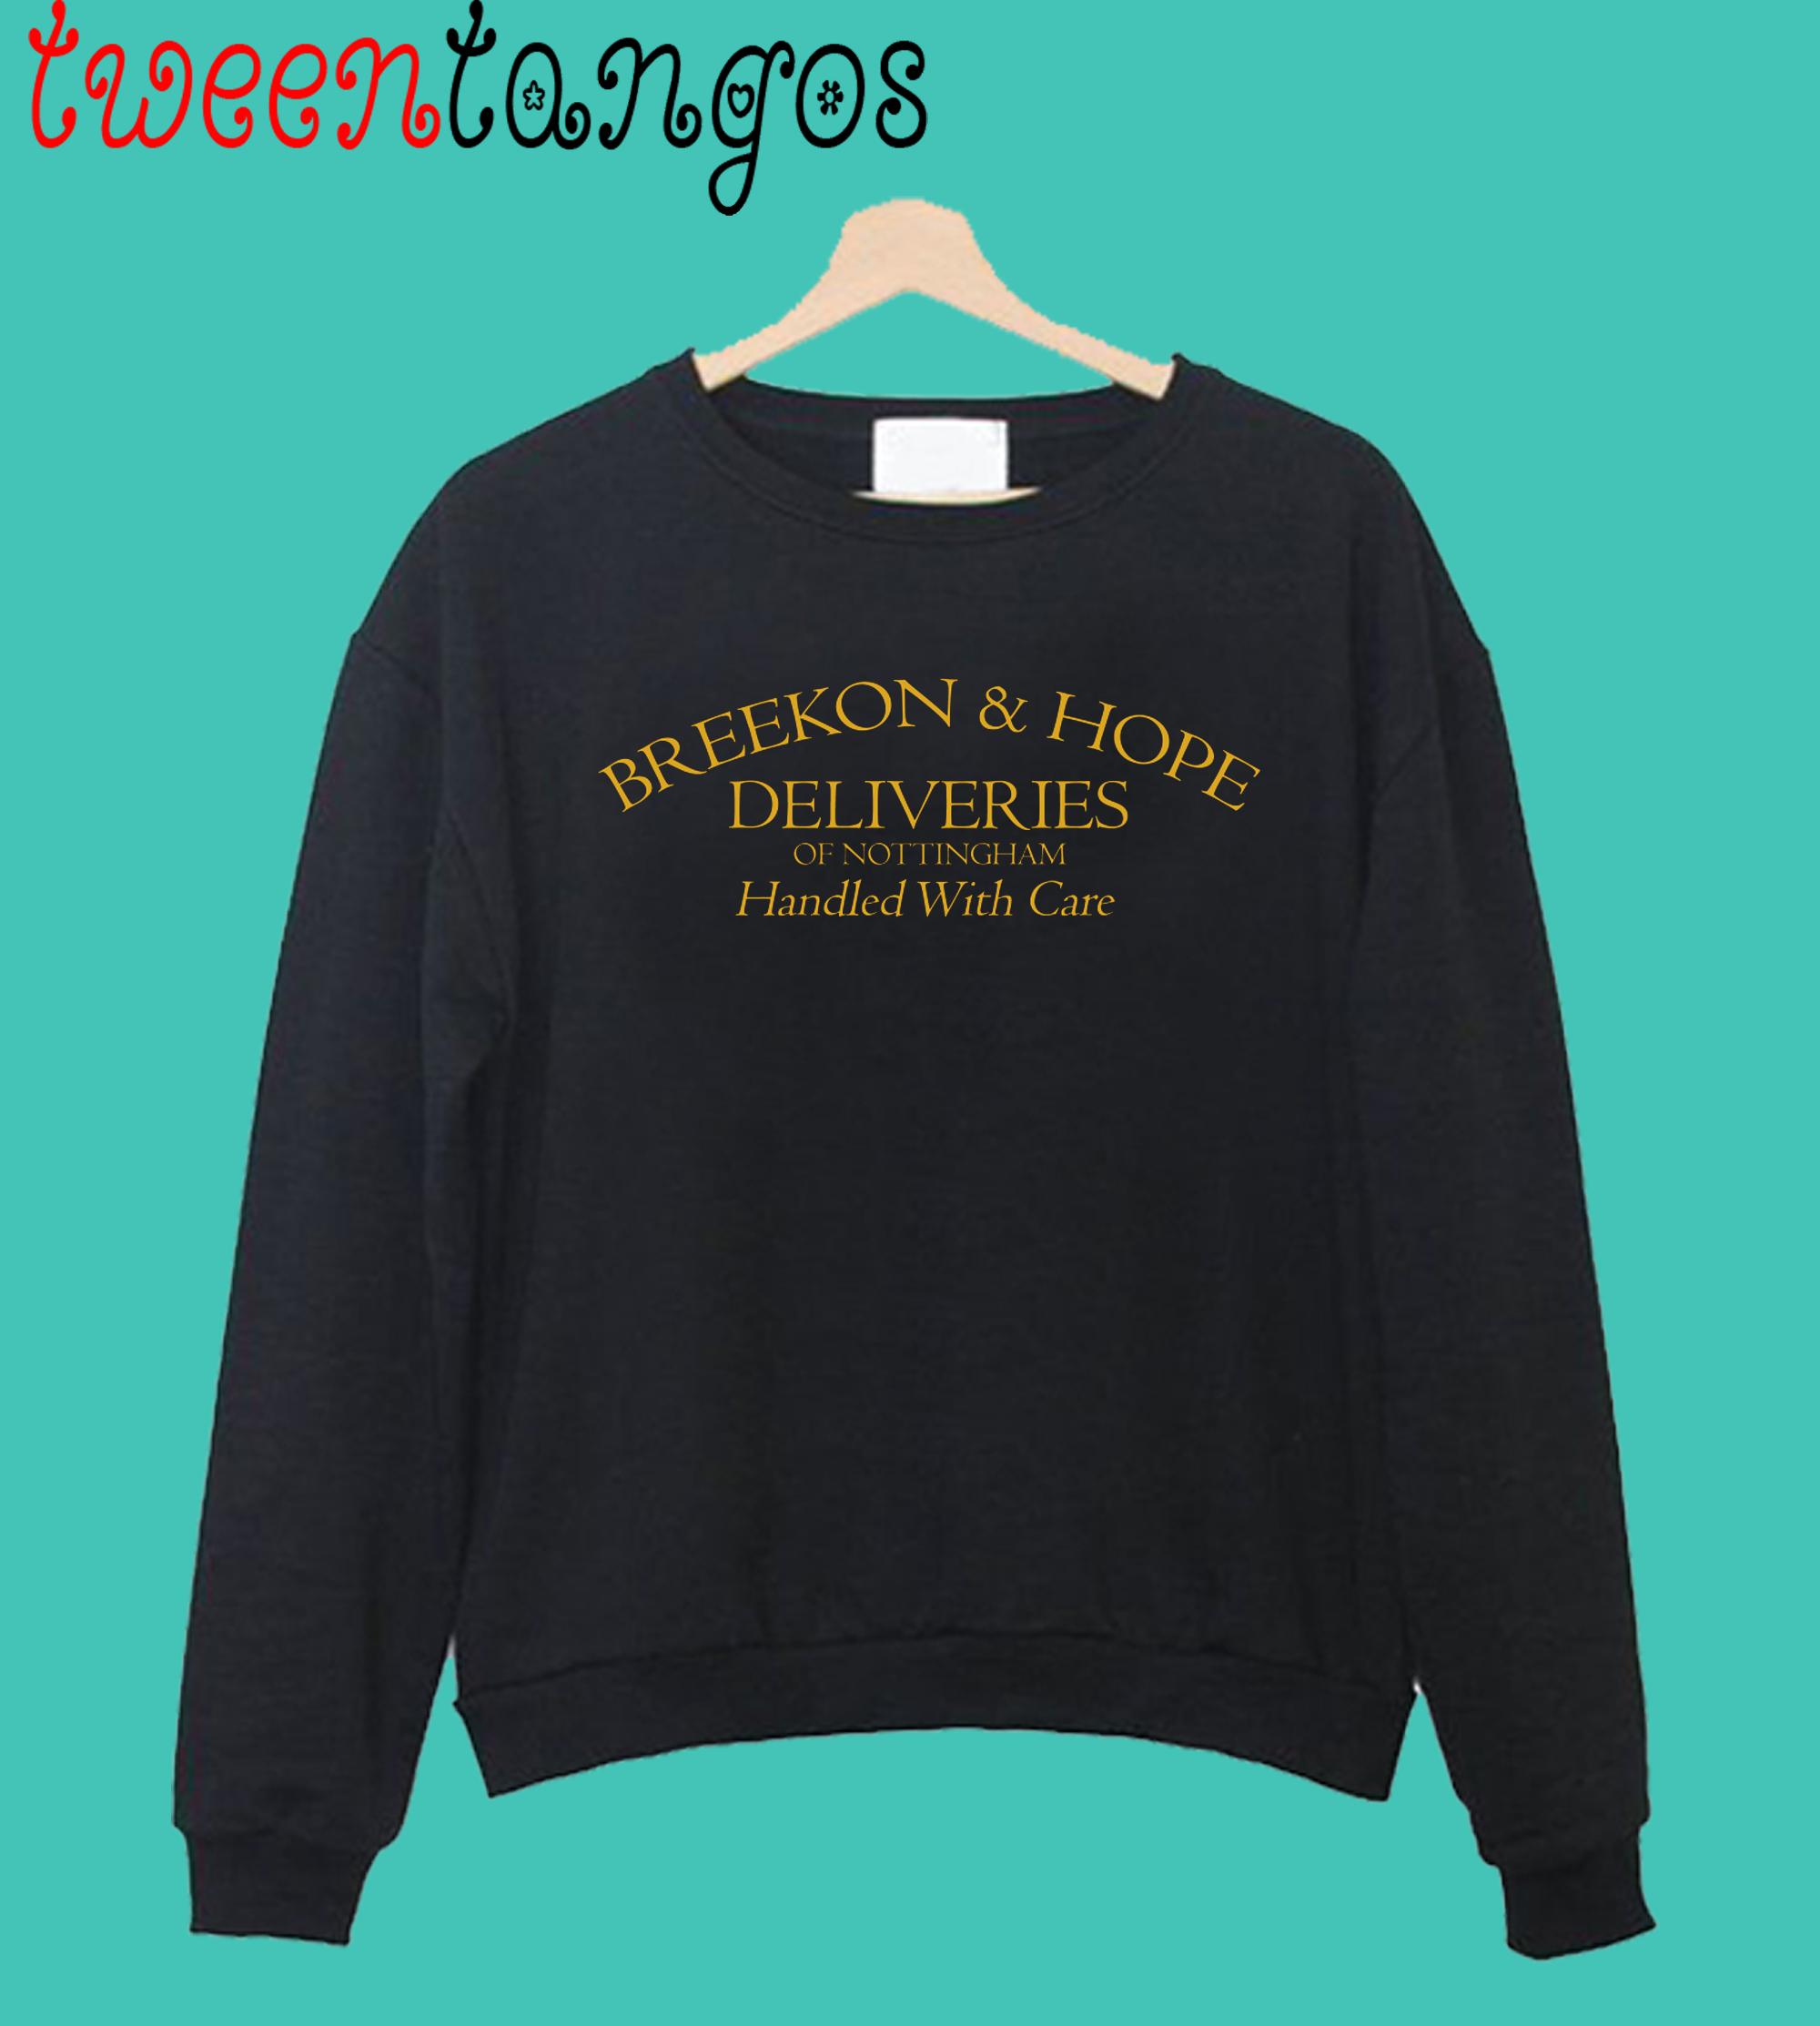 Breekon & Hope Deliveries Crewneck Sweatshirt